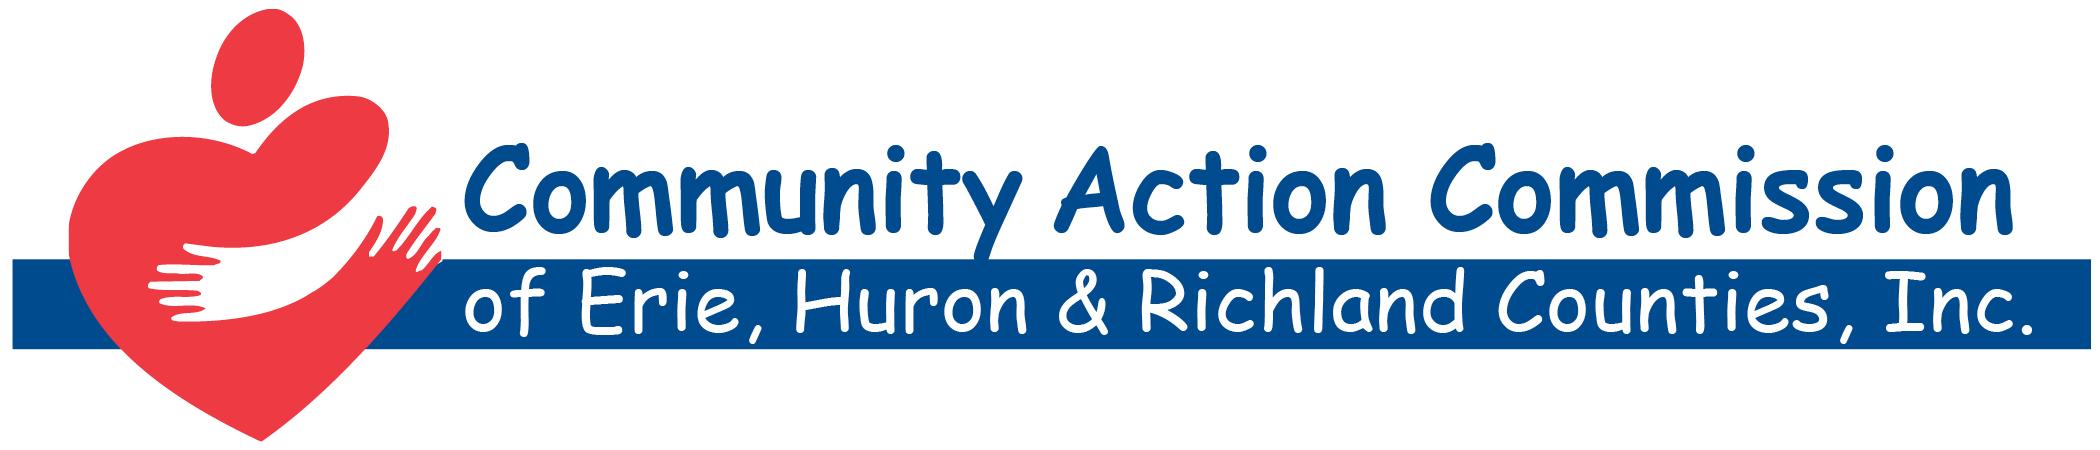 Community Action Commission Of EHRC's Logo